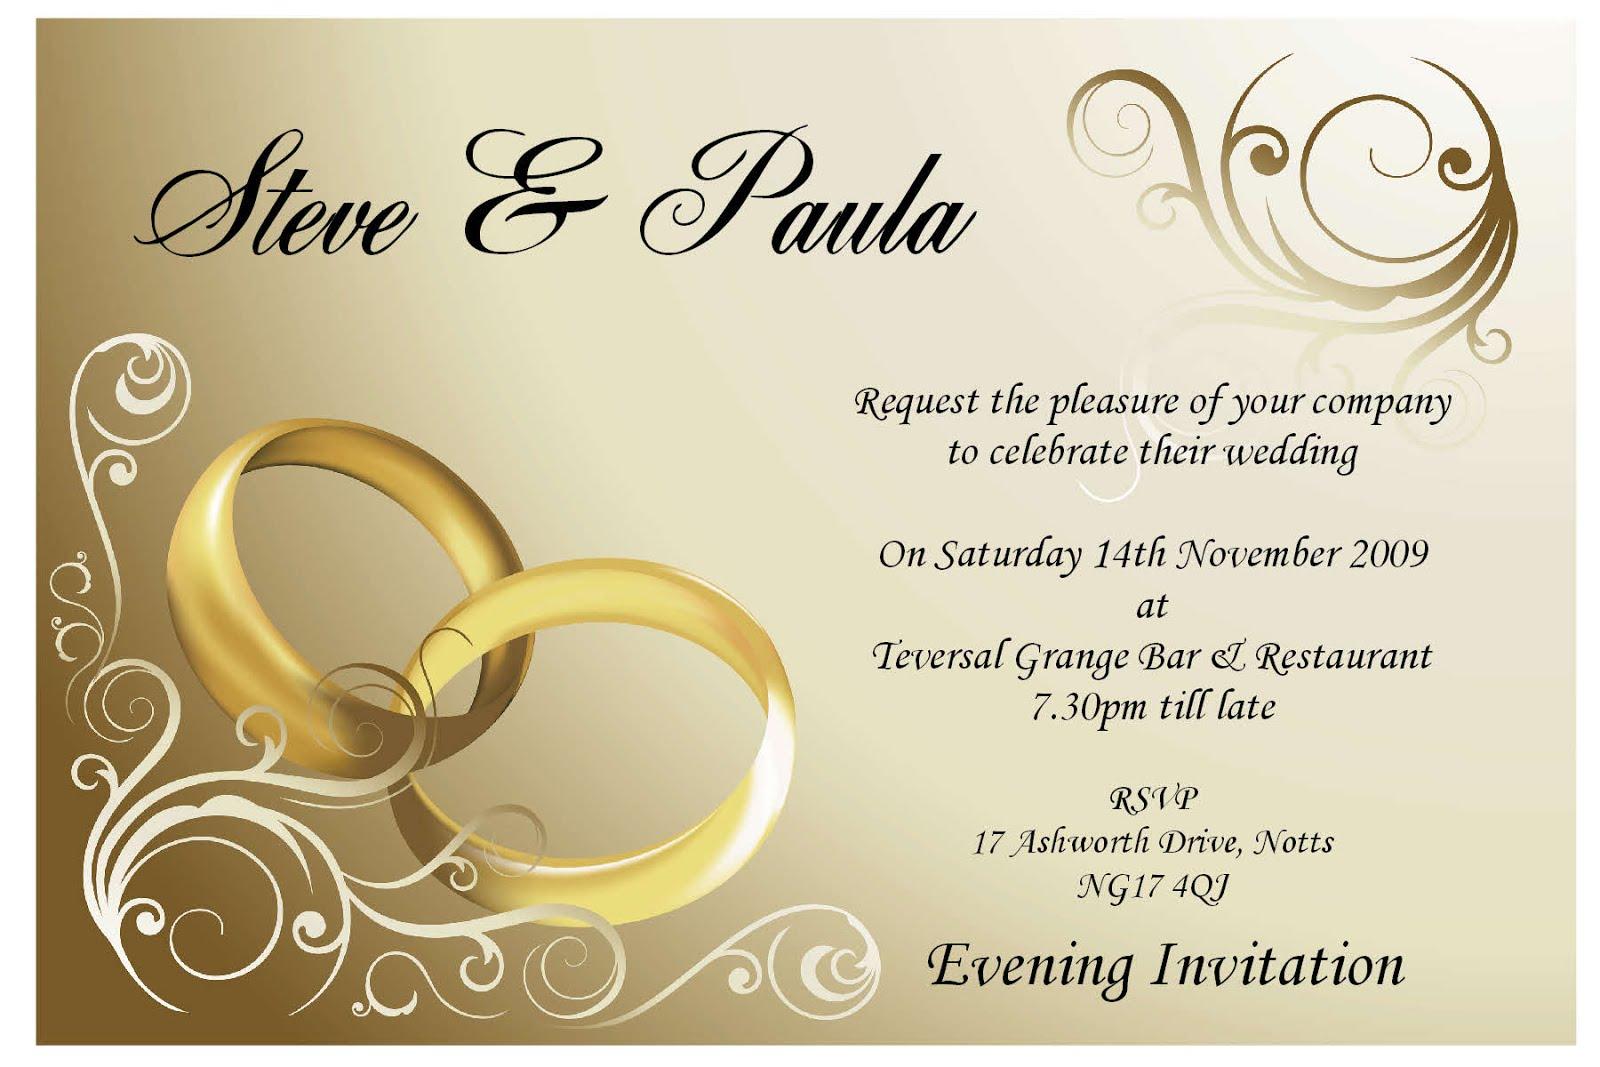 Best Ideas for Wedding Invitation ~ Wedding Celebration | Wedding ...